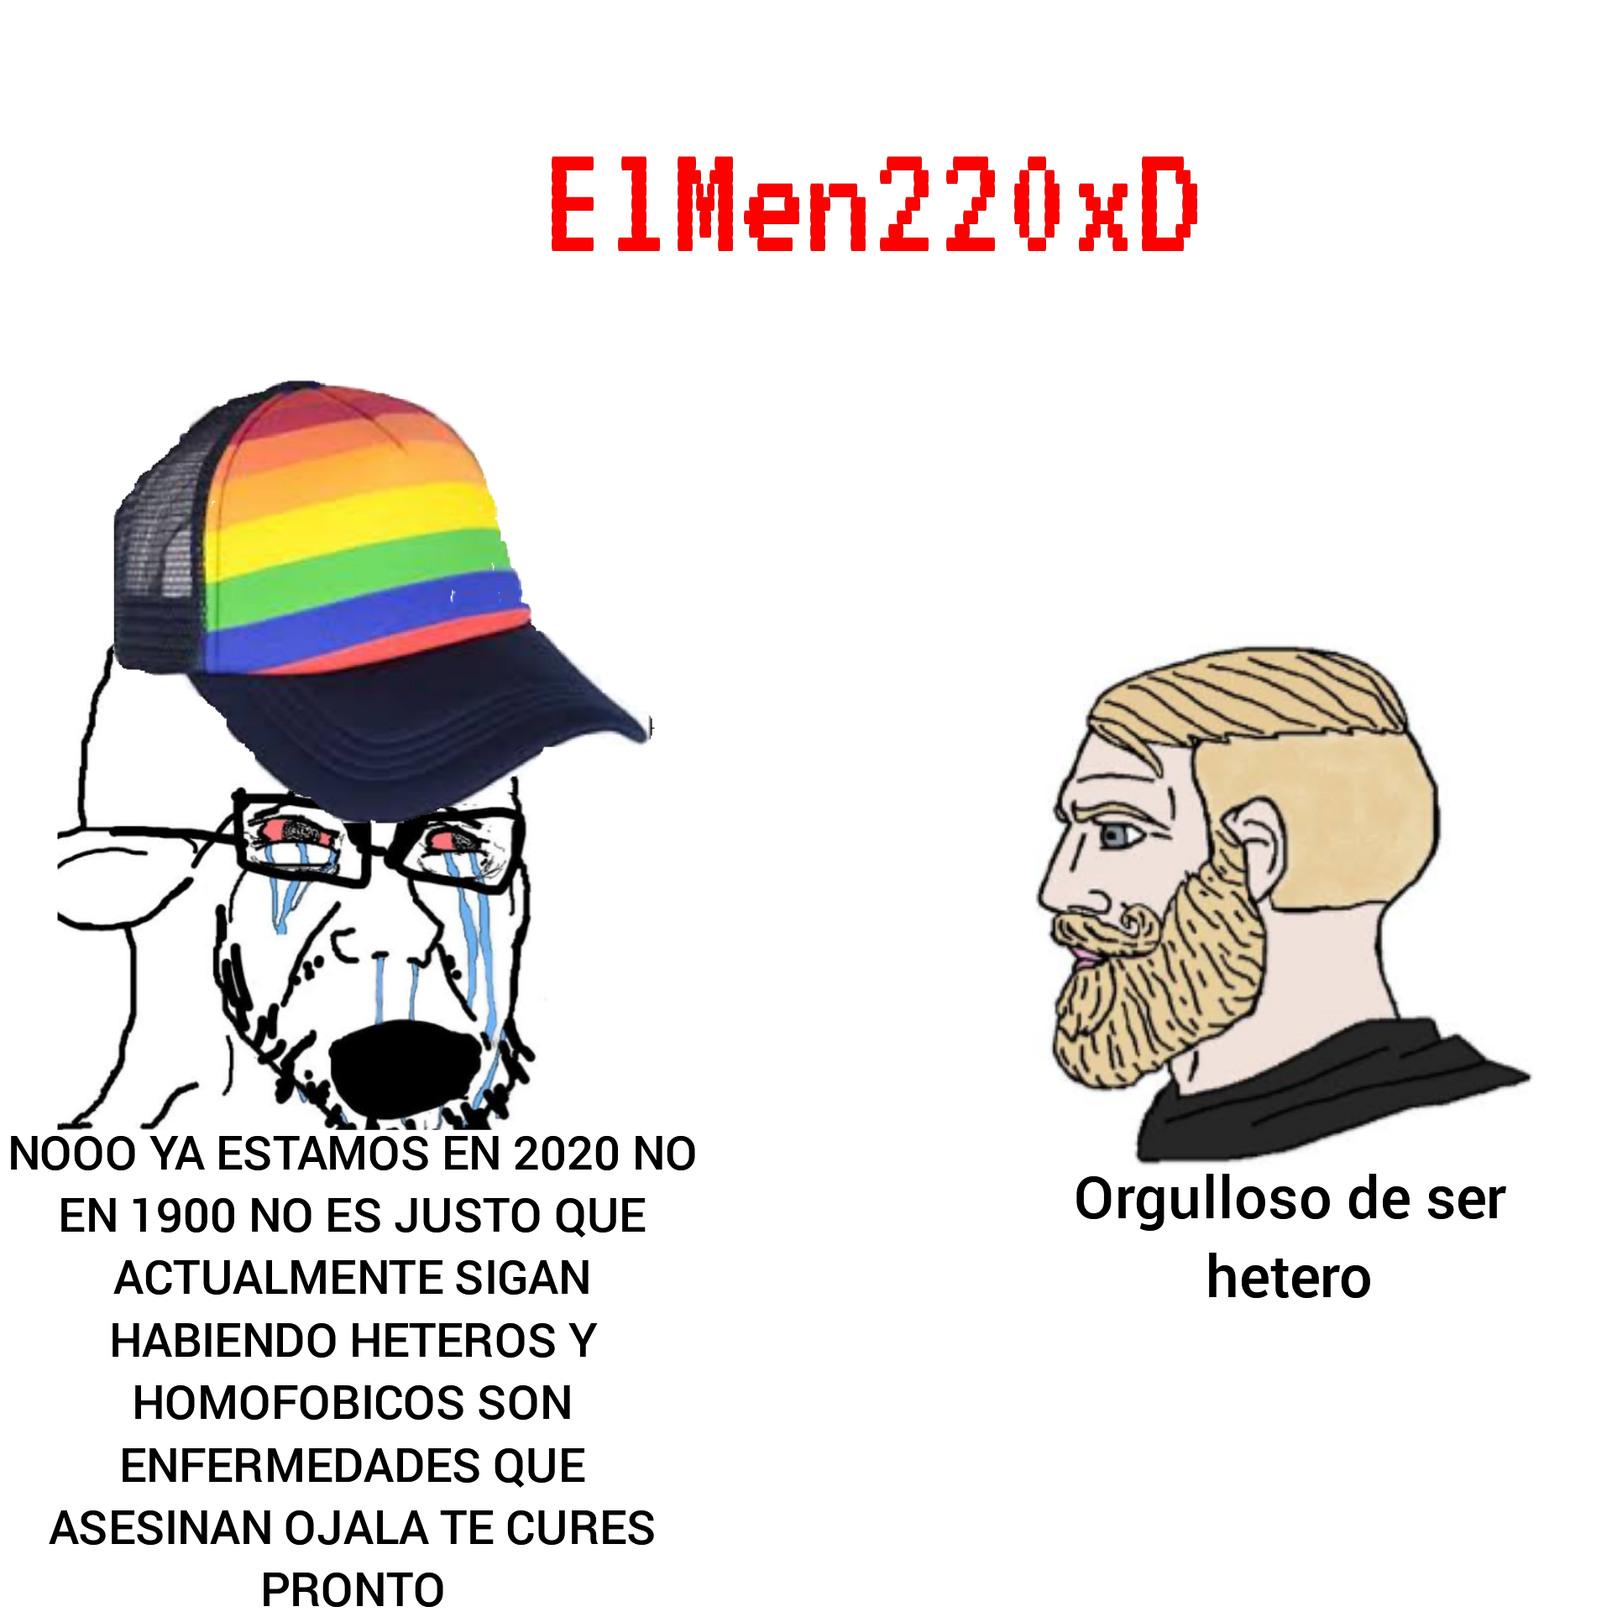 Orgulloso de ser hetero - meme